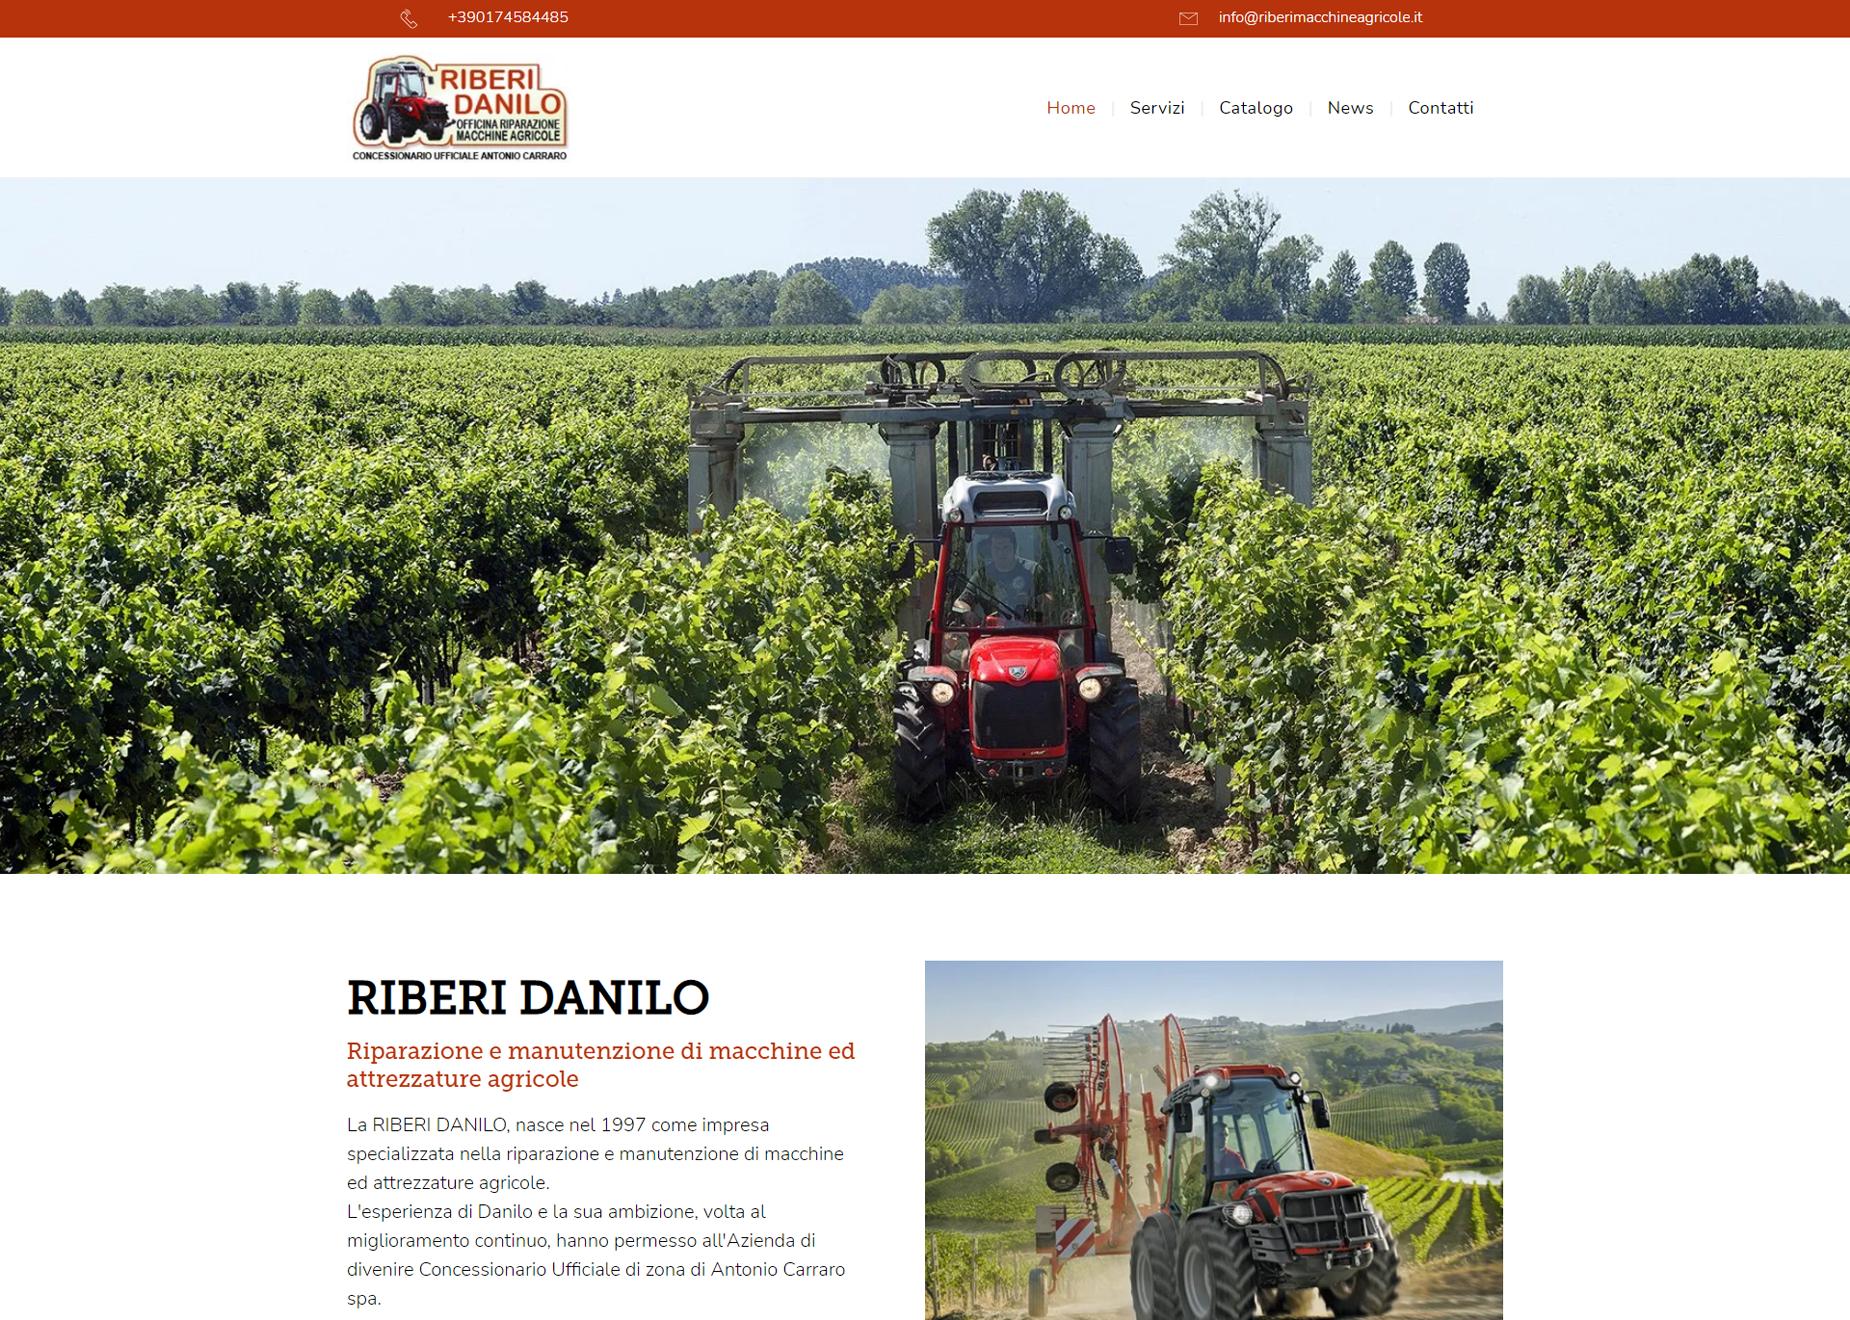 Riberi macchine agricole